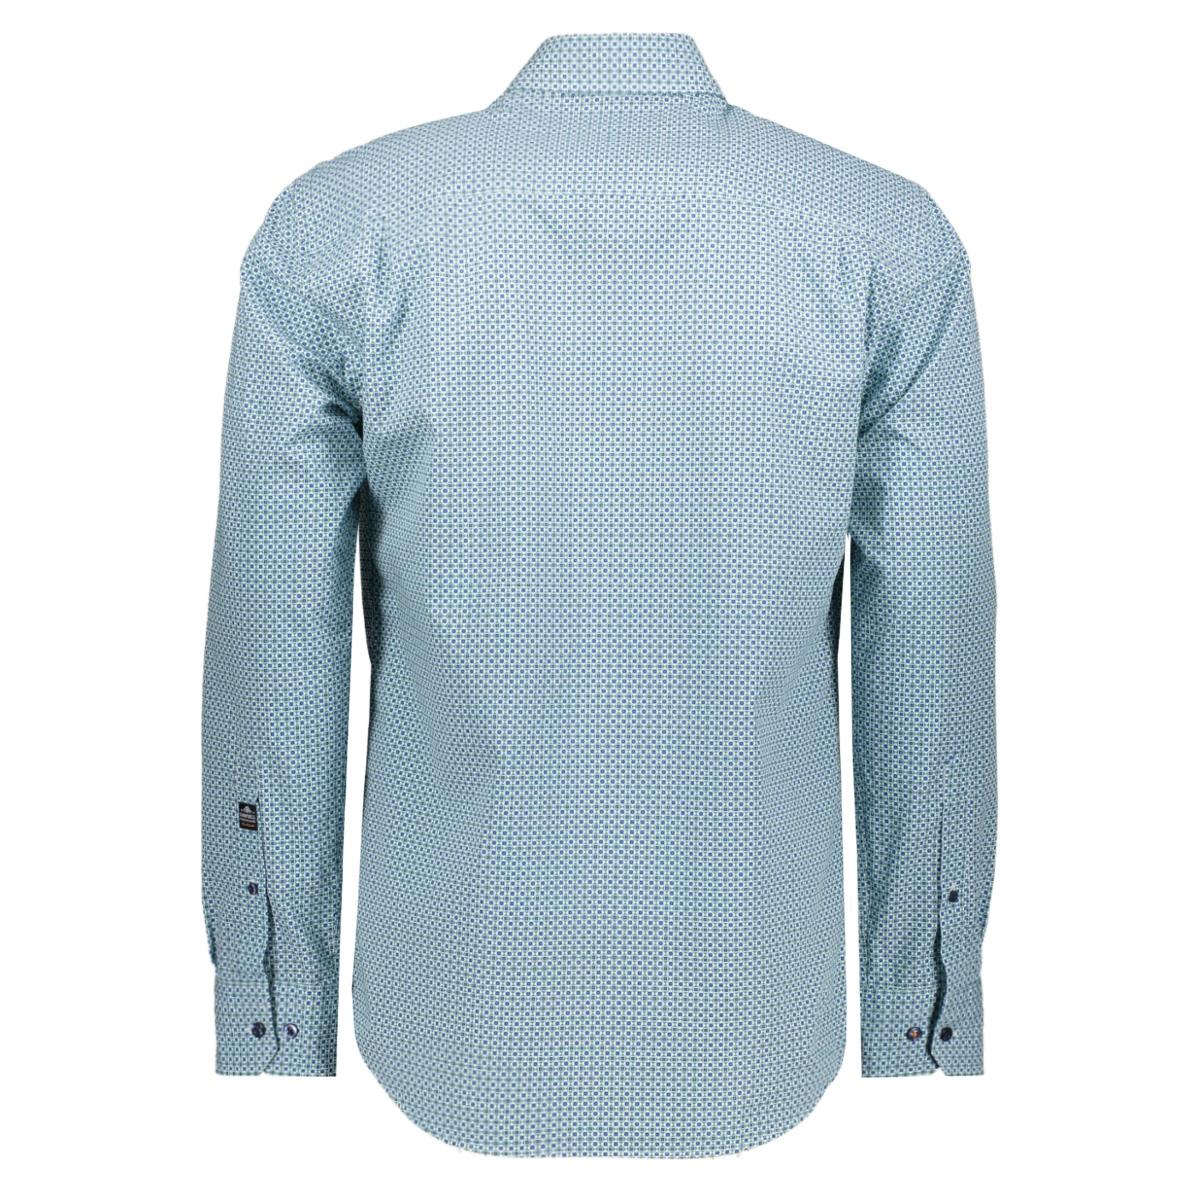 casual overhemd lm 052886 campbell overhemd 408 groen print